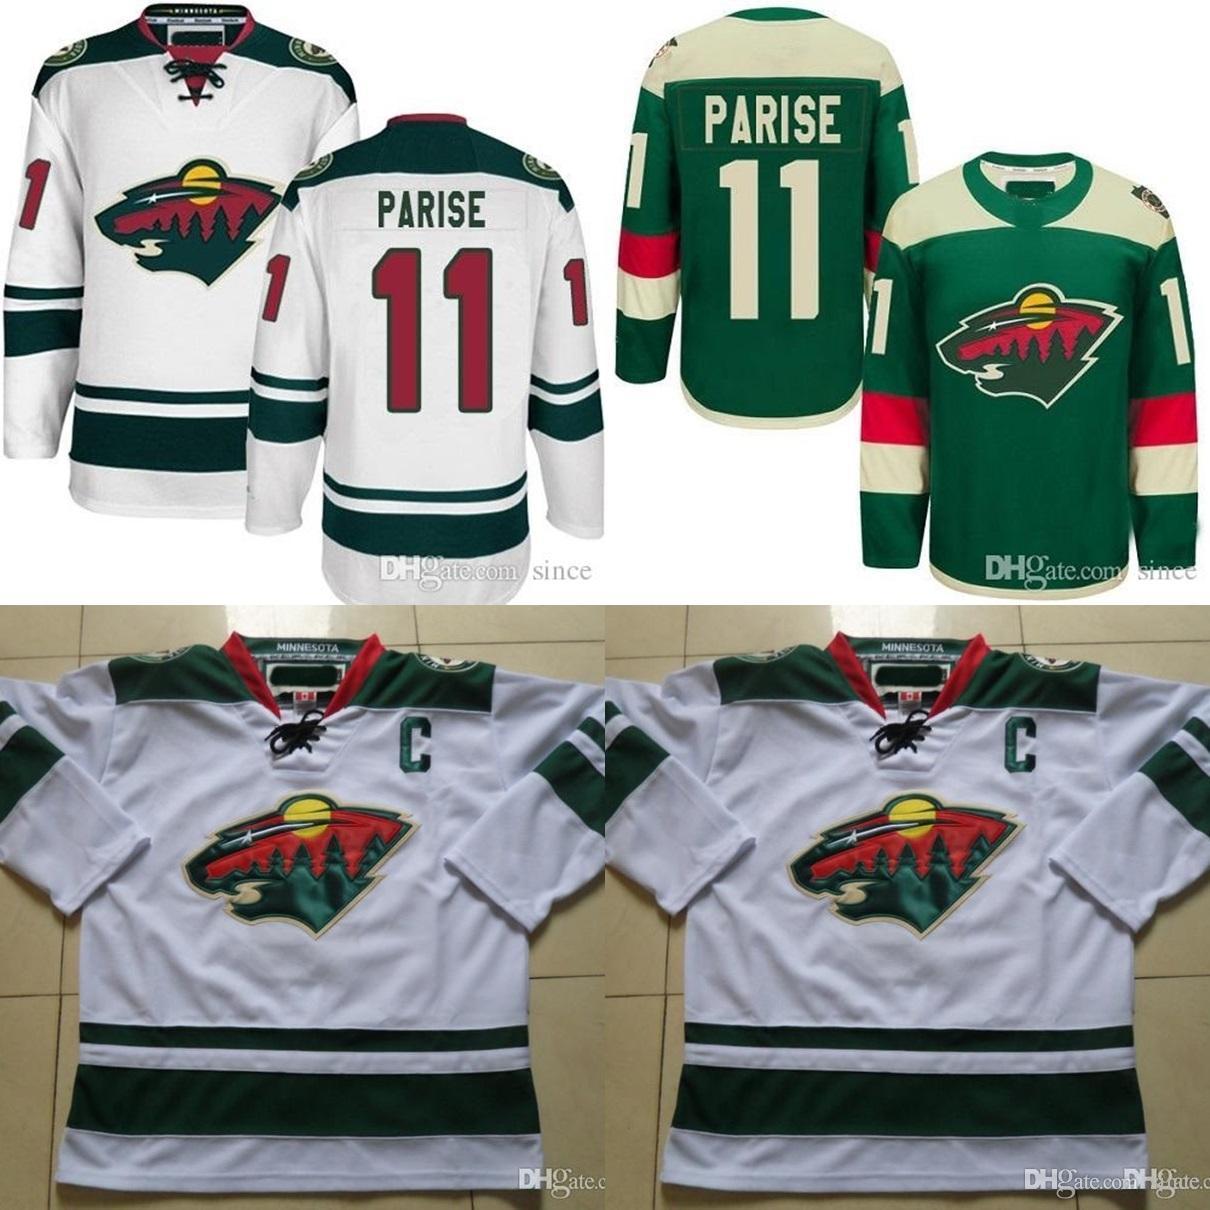 2019 2016 New Arrivials Mens 11 Zach Parise Minnesota Wild Jersey Green  Alternate Stitched Cheap 2015 Mens Ice Hockey Jerseys MN Wild Sportswear  From Since 423dabfcc14